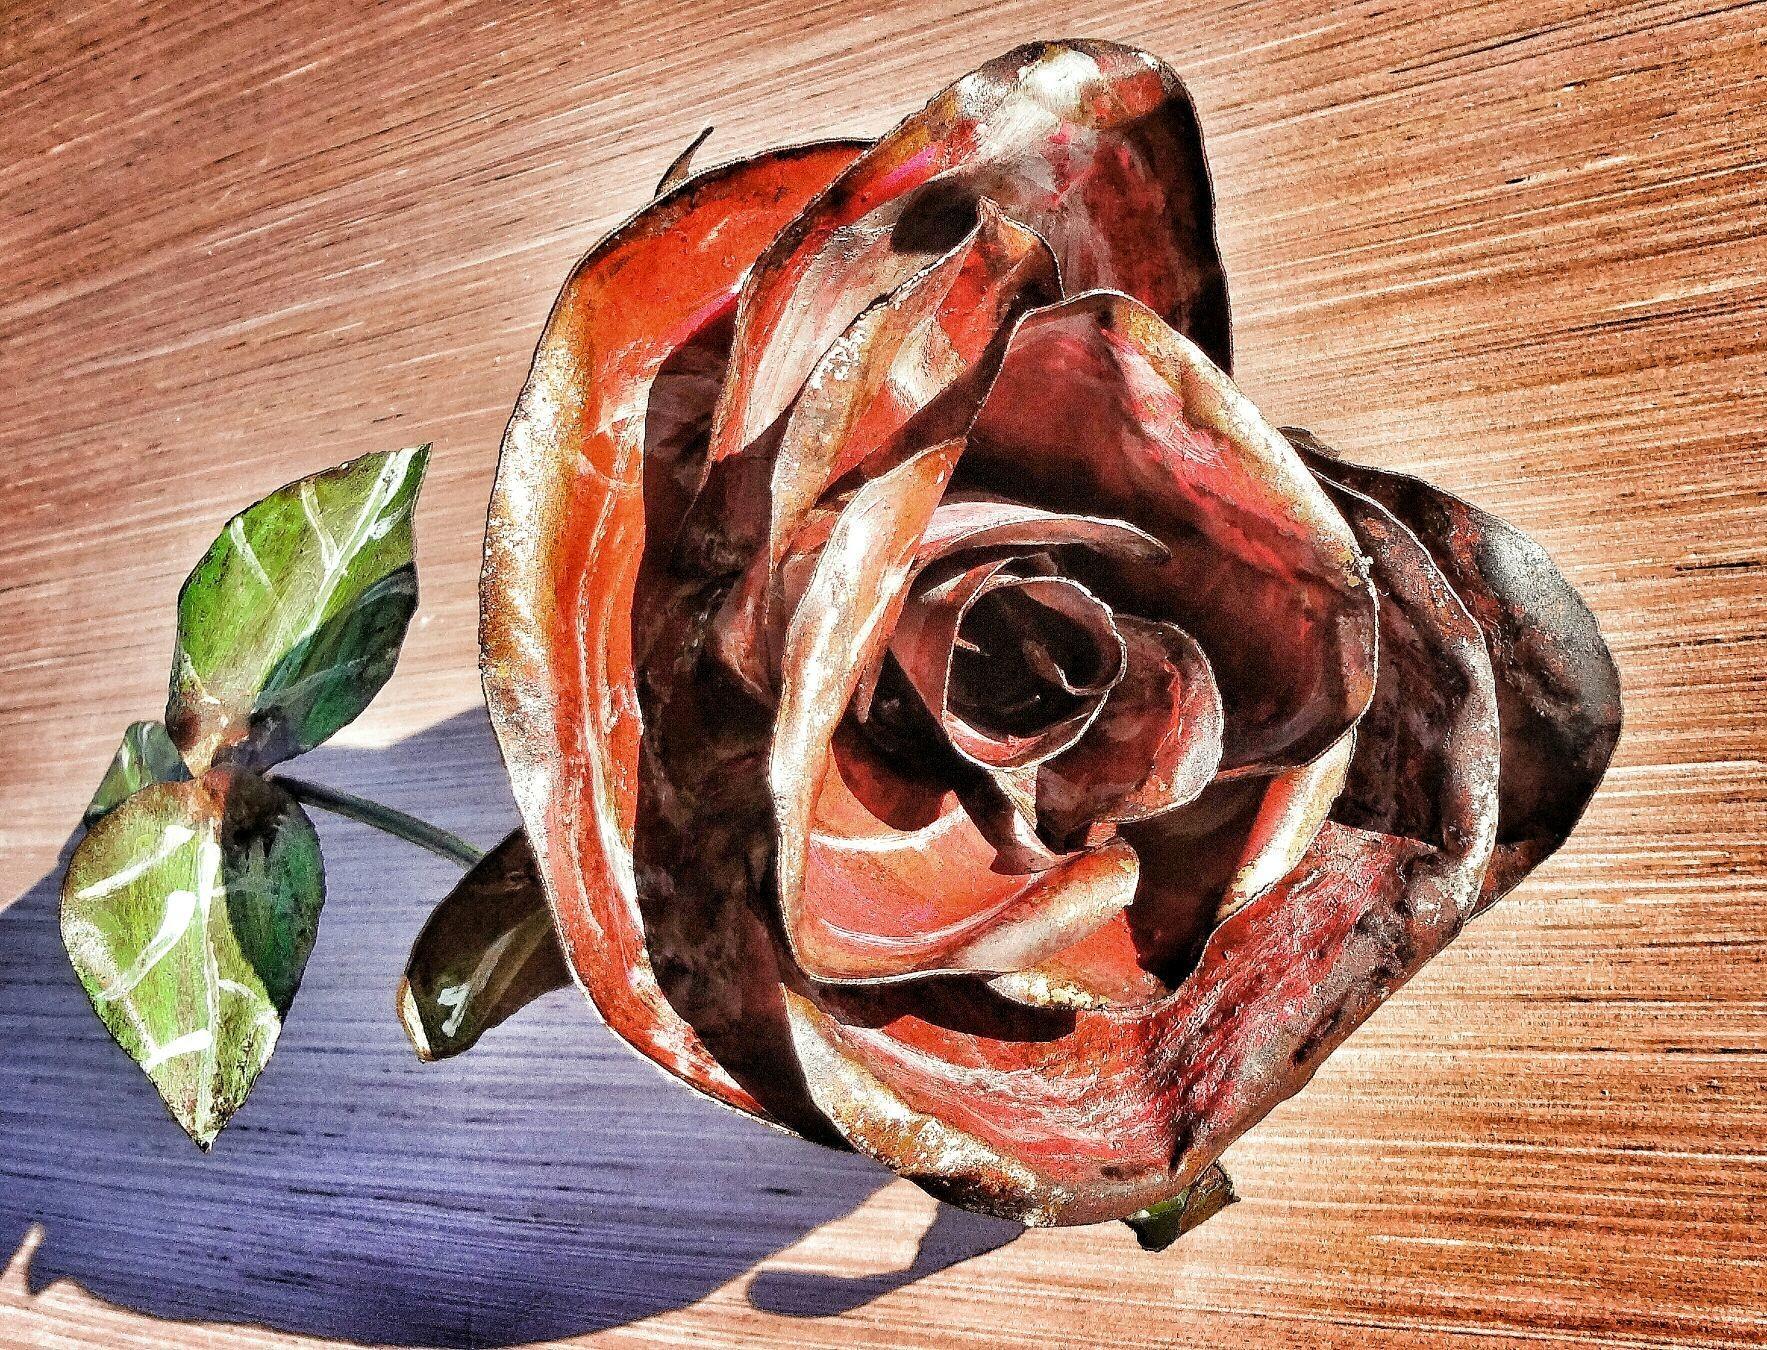 #TheBeardedWelder #MetalArt #TheBeardedWelder #MetalArt #rose #heaven #hell #sculpture #flower #hope #newyear #karma #origina #chive #chivette #saturday #sunday #beard #slipknot #clutch #marketplace #icehouse #pi